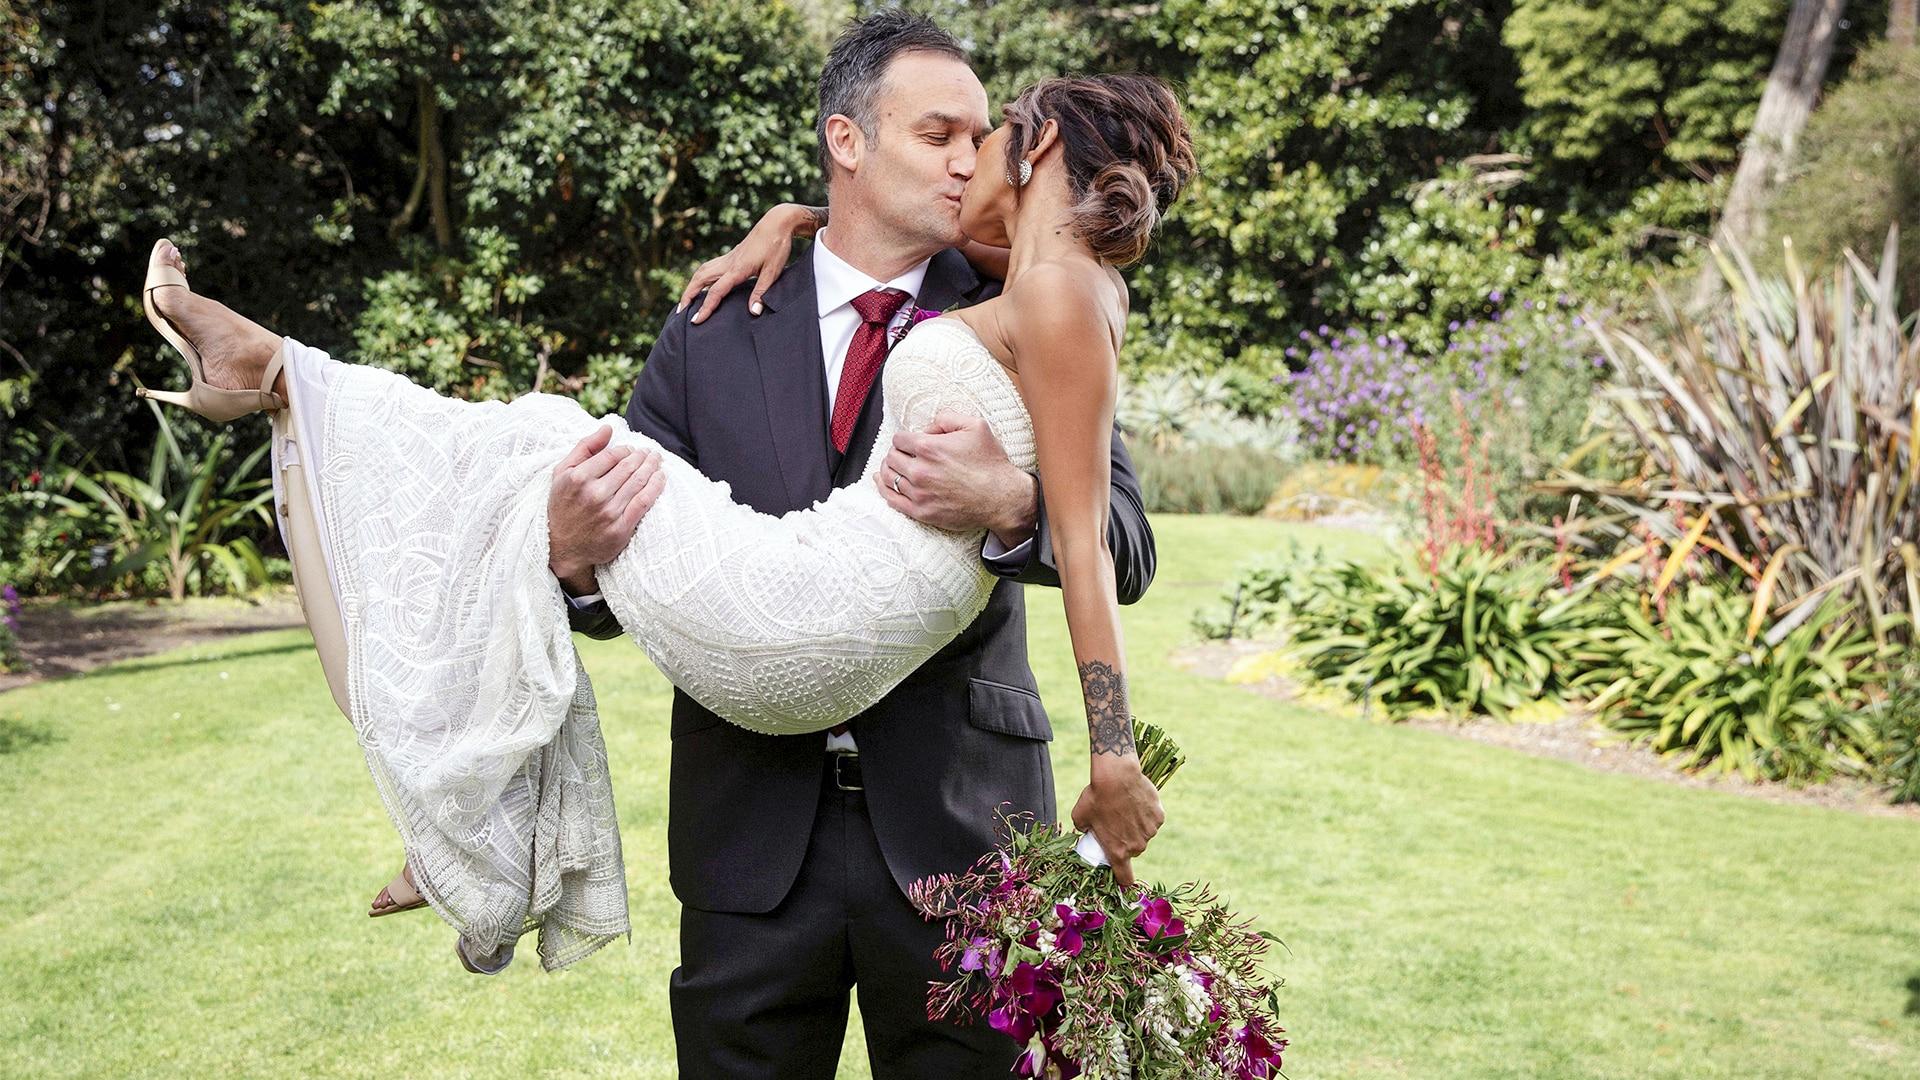 married at first sight australia season 6 - photo #20